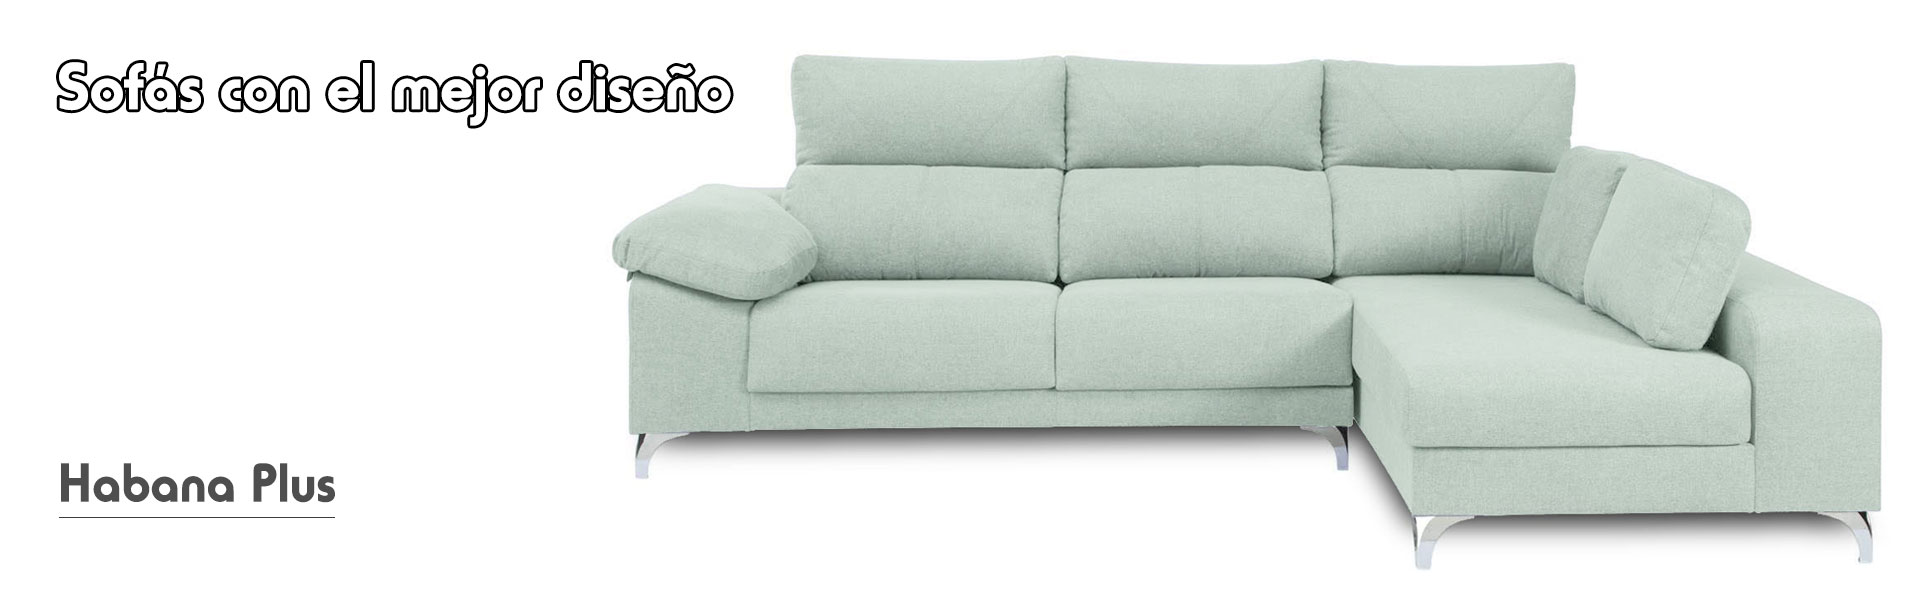 Sofa habana cuba bela verde1